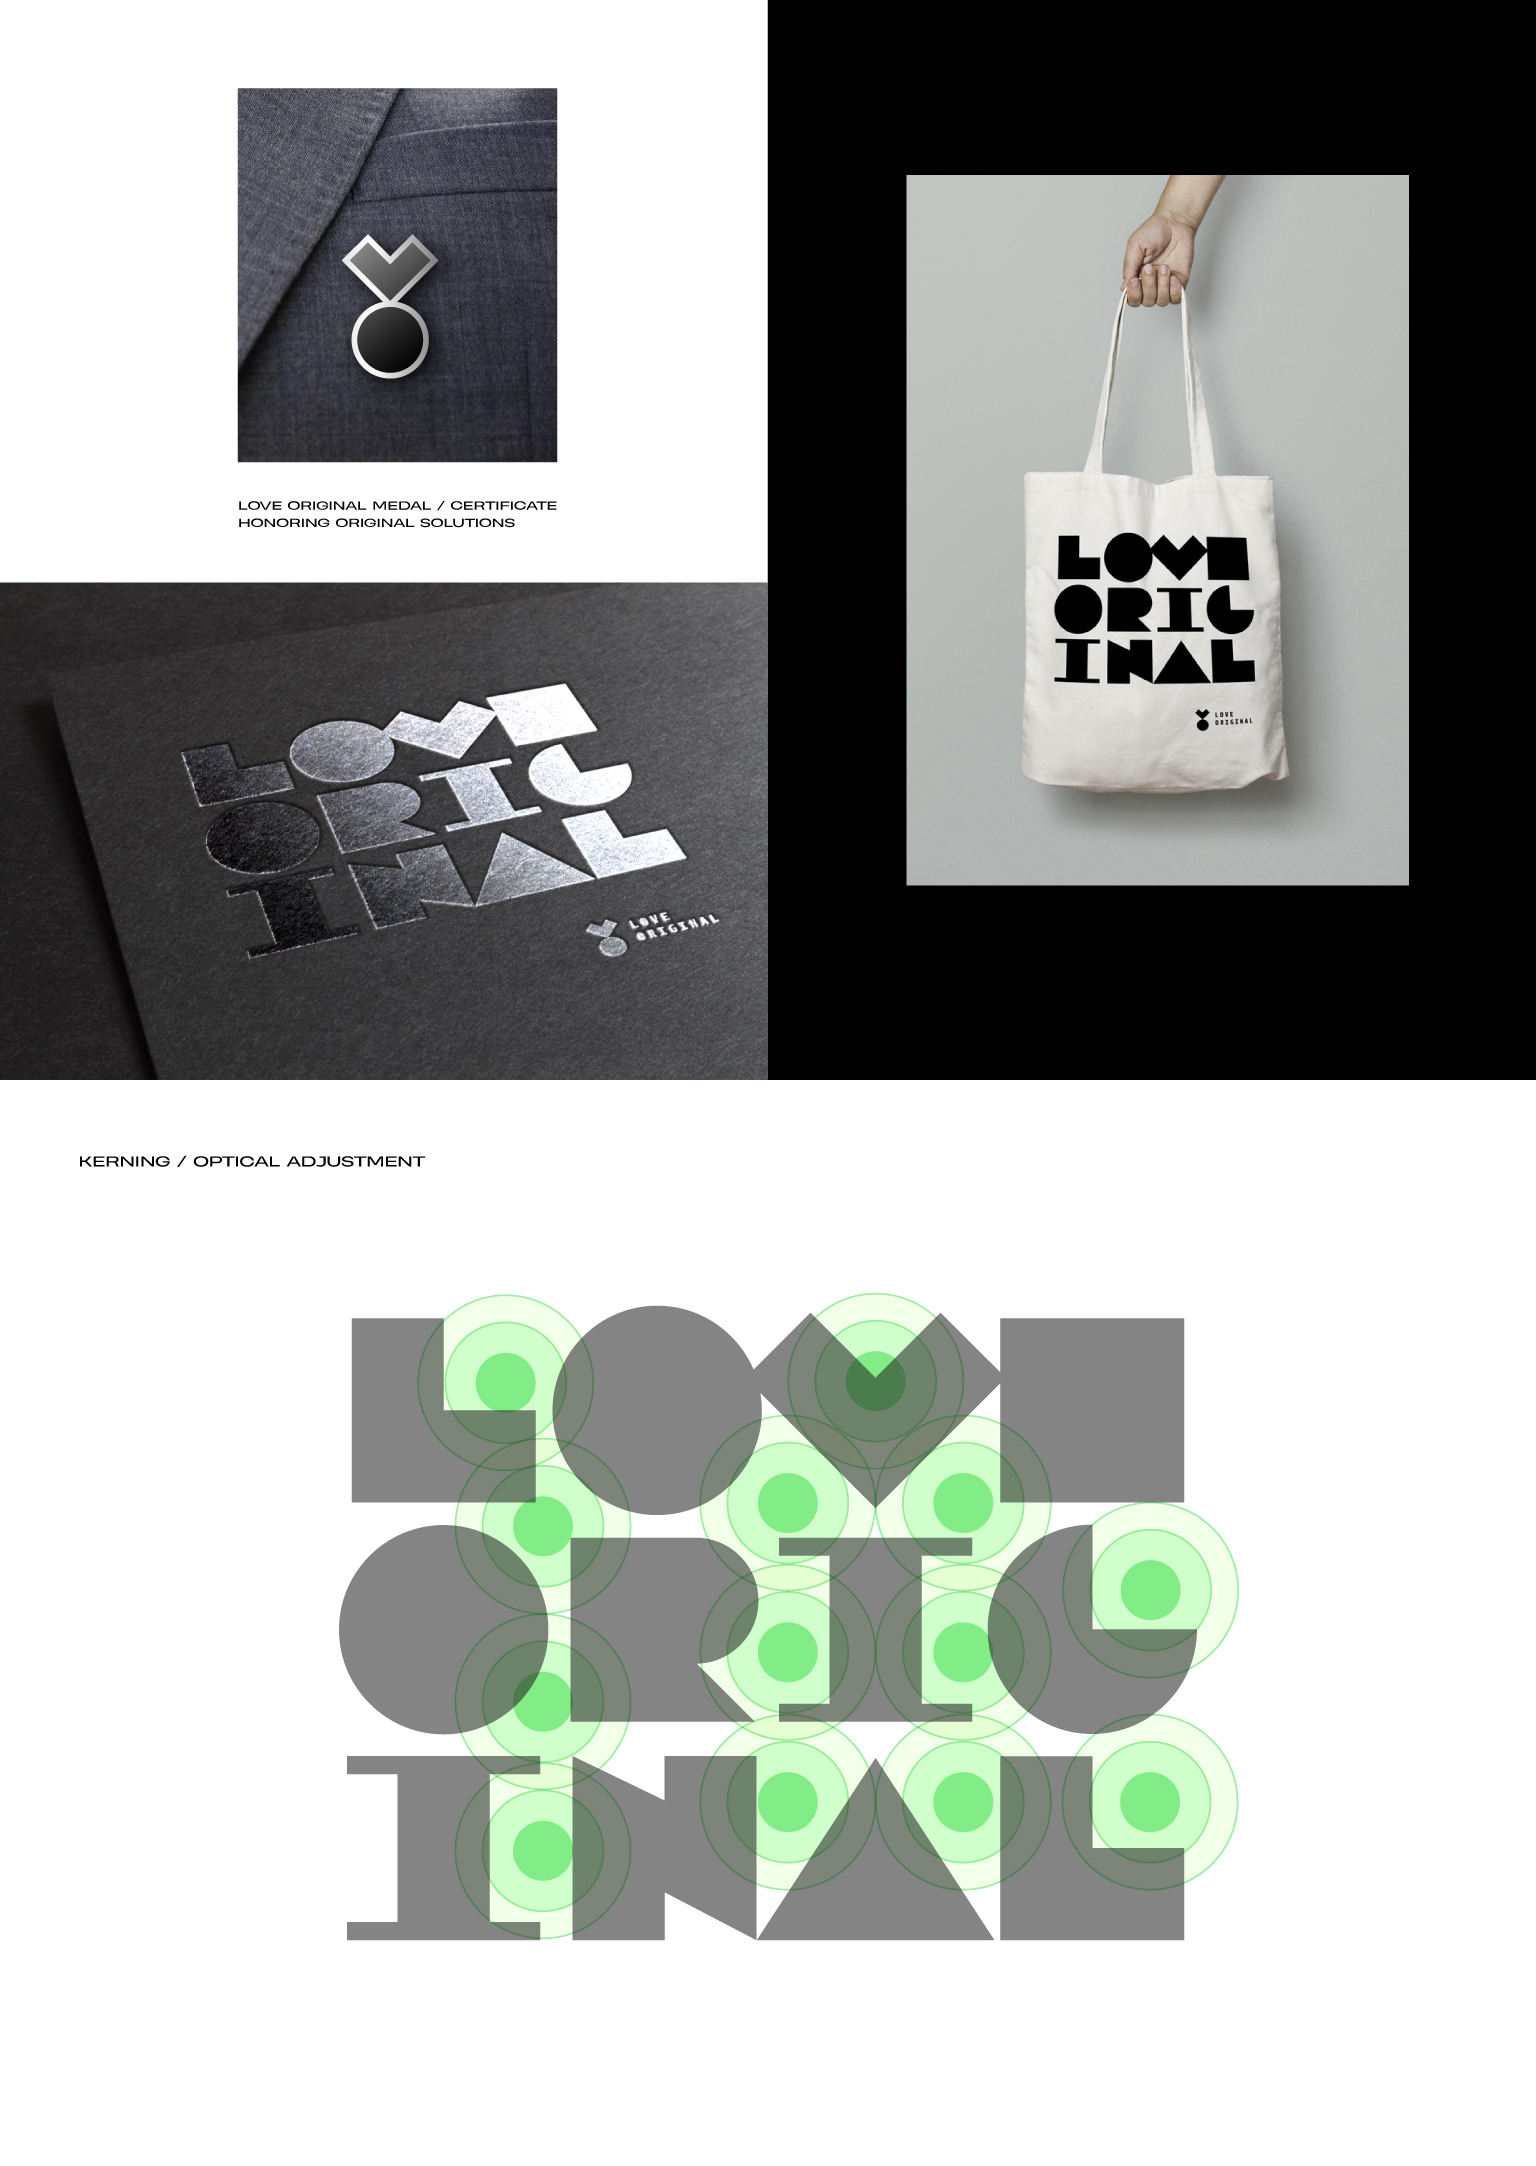 Love Original by Wojciech Janicki - Creative Work - $i